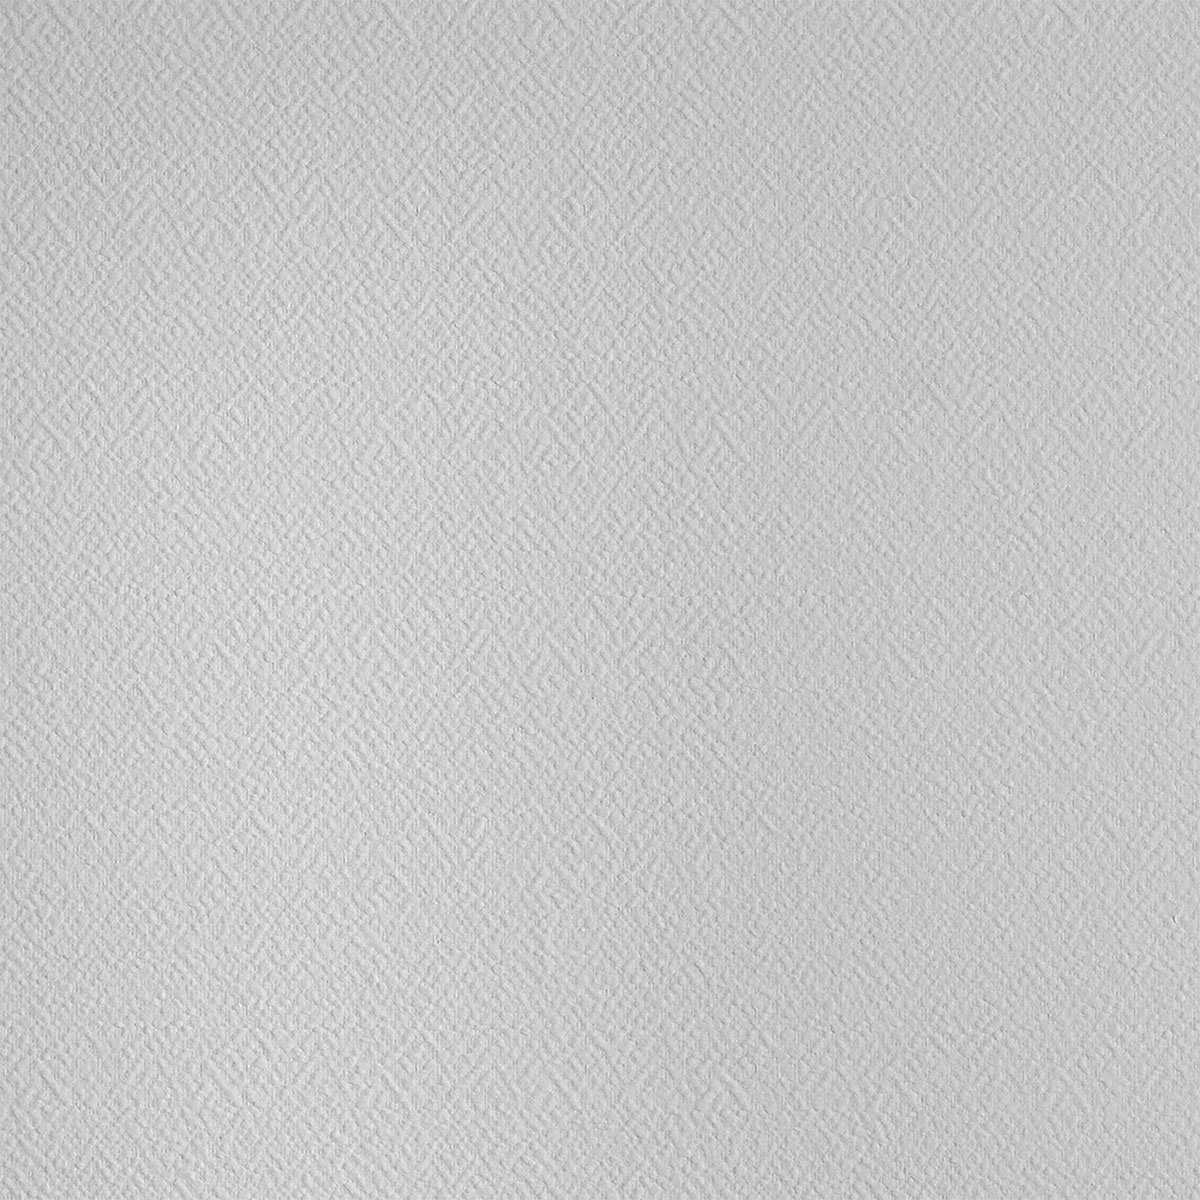 Стеклообои Креп Wellton Optima  1 х 25 м WO115